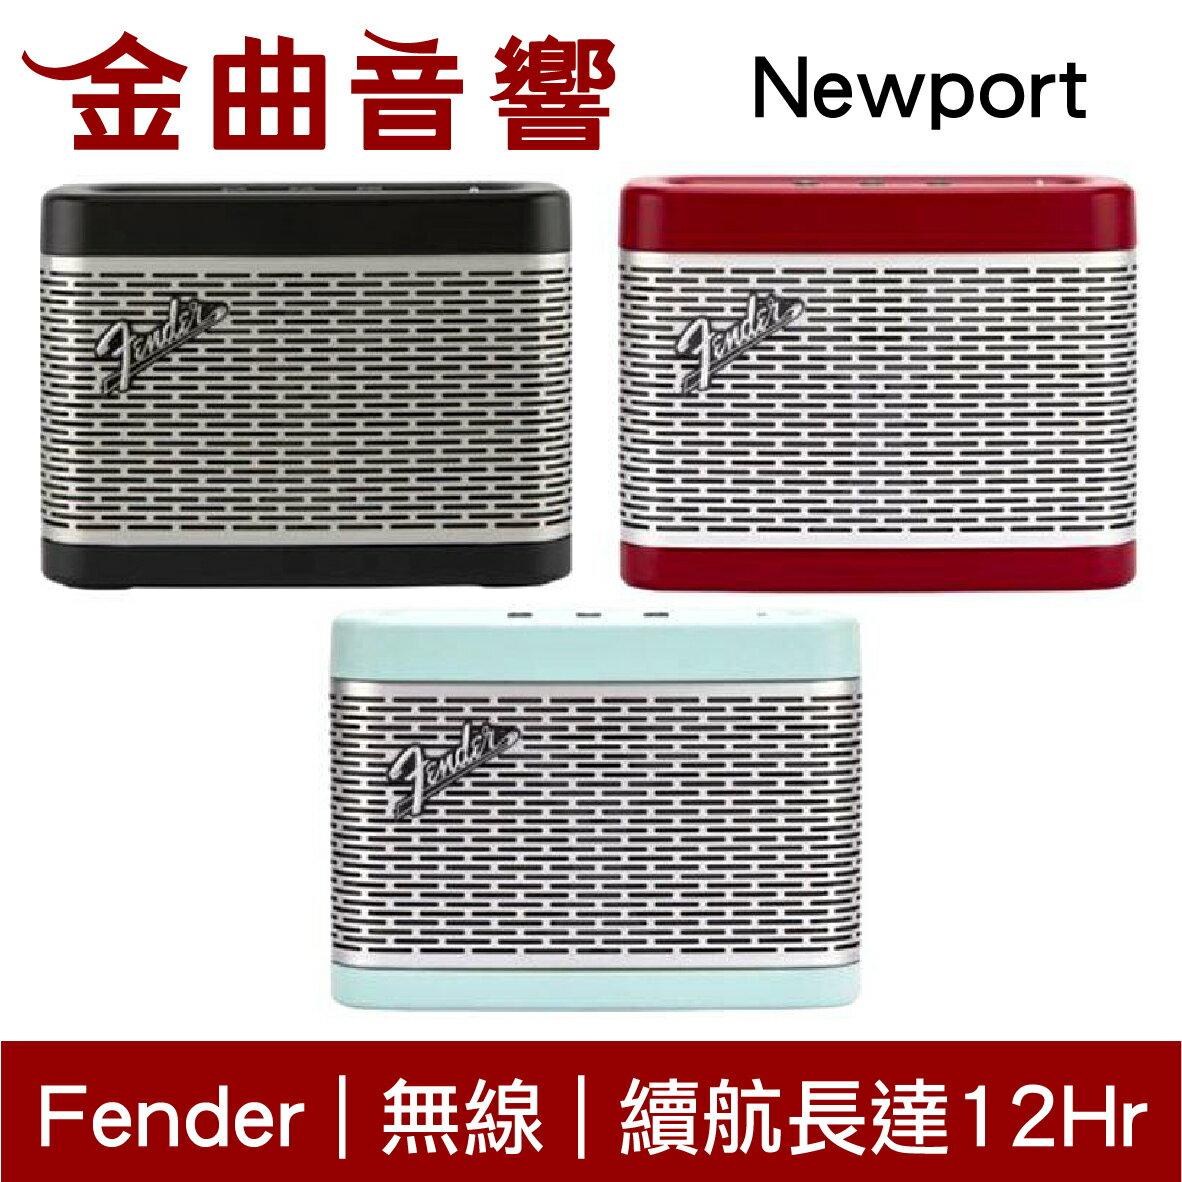 Fender Newport 粉藍色 藍牙喇叭 無線 充電式 可攜帶   金曲音響